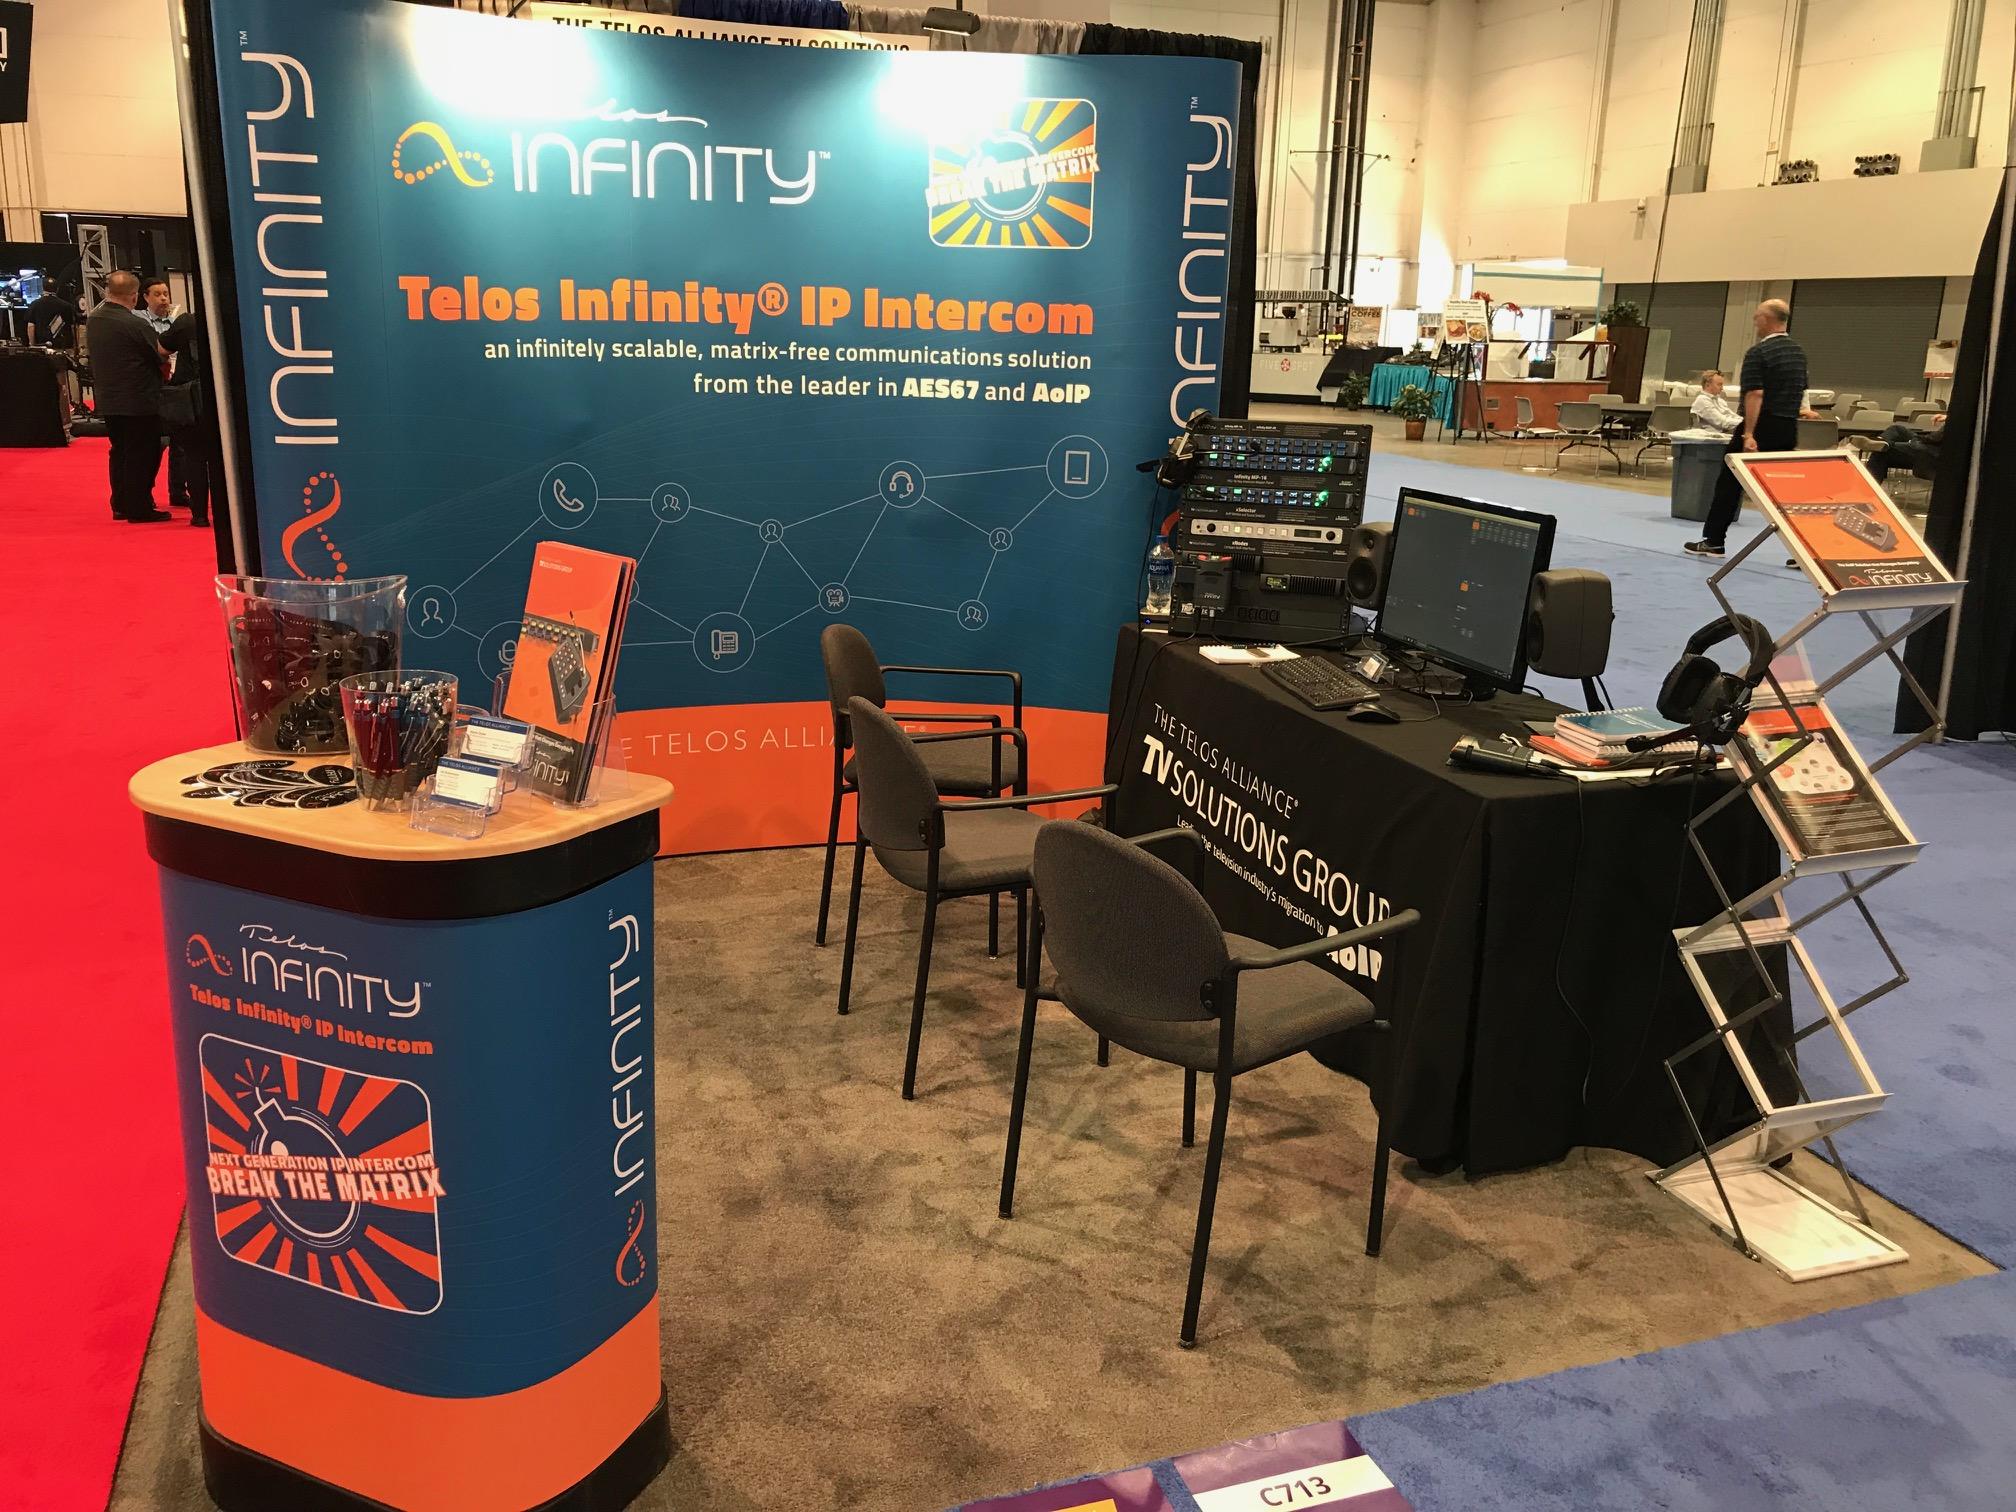 Live at InfoComm 2018! Telos Infinity IP Intercom Breaks Into New Markets